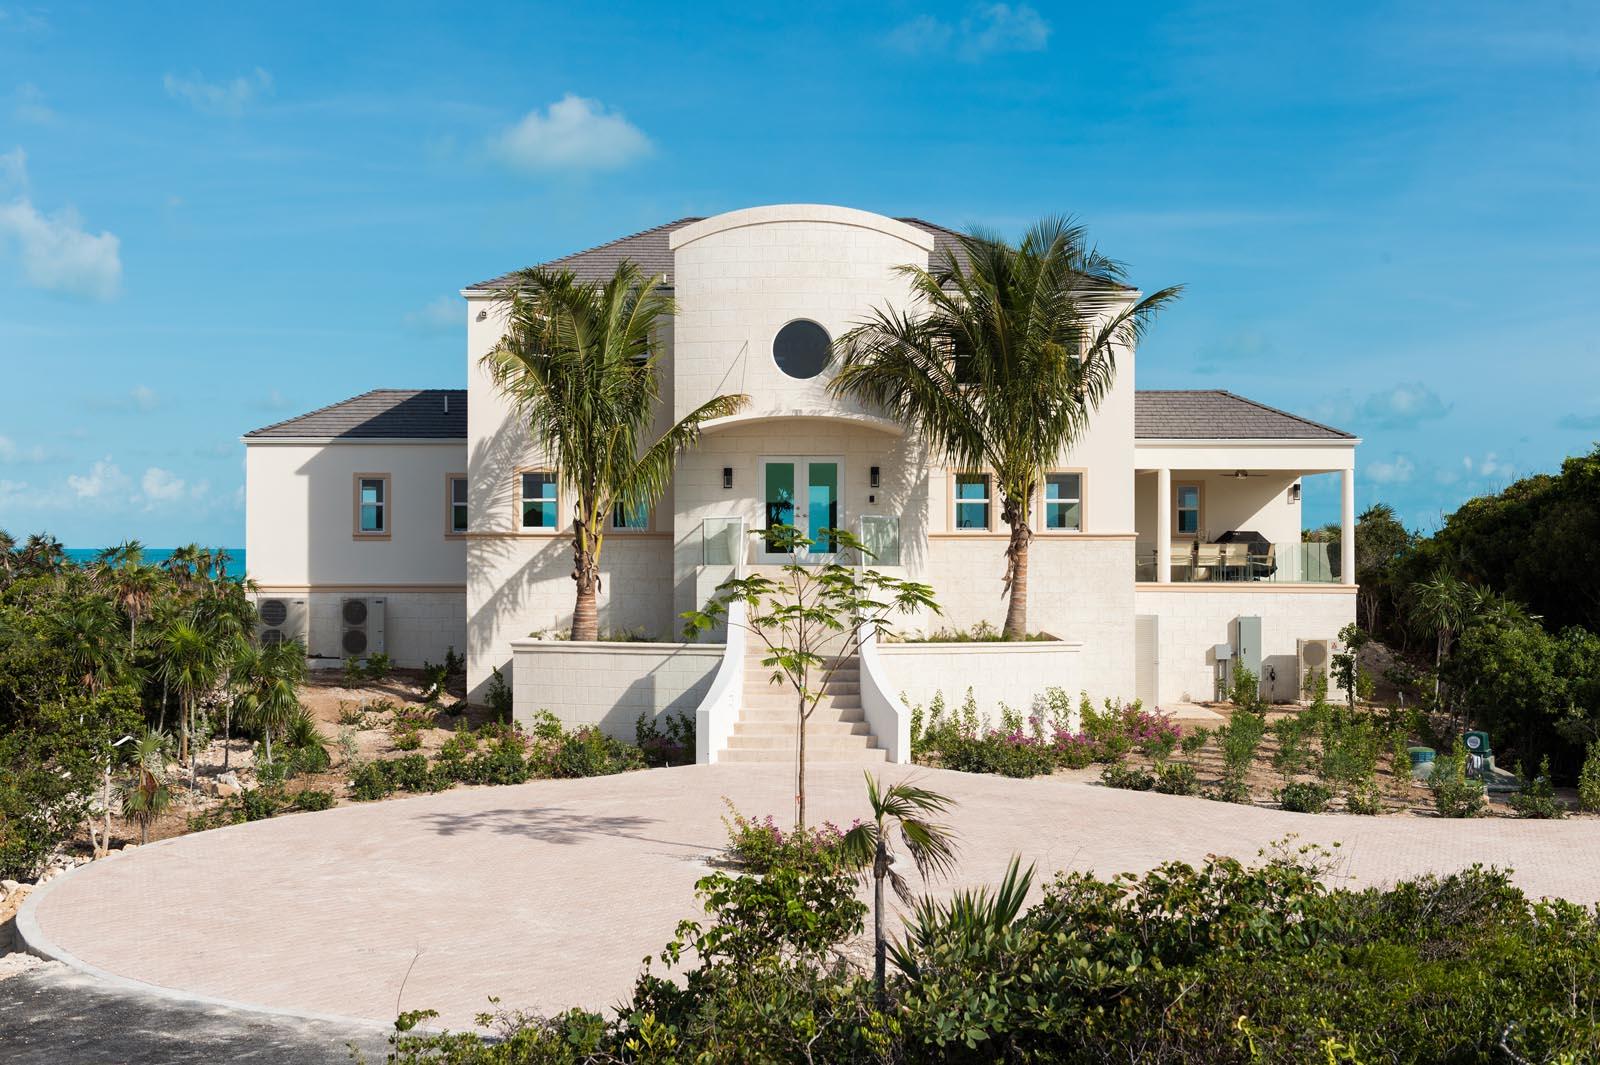 The entrance to Villa Isla, Long Bay Beach, Providenciales (Provo), Turks and Caicos Islands